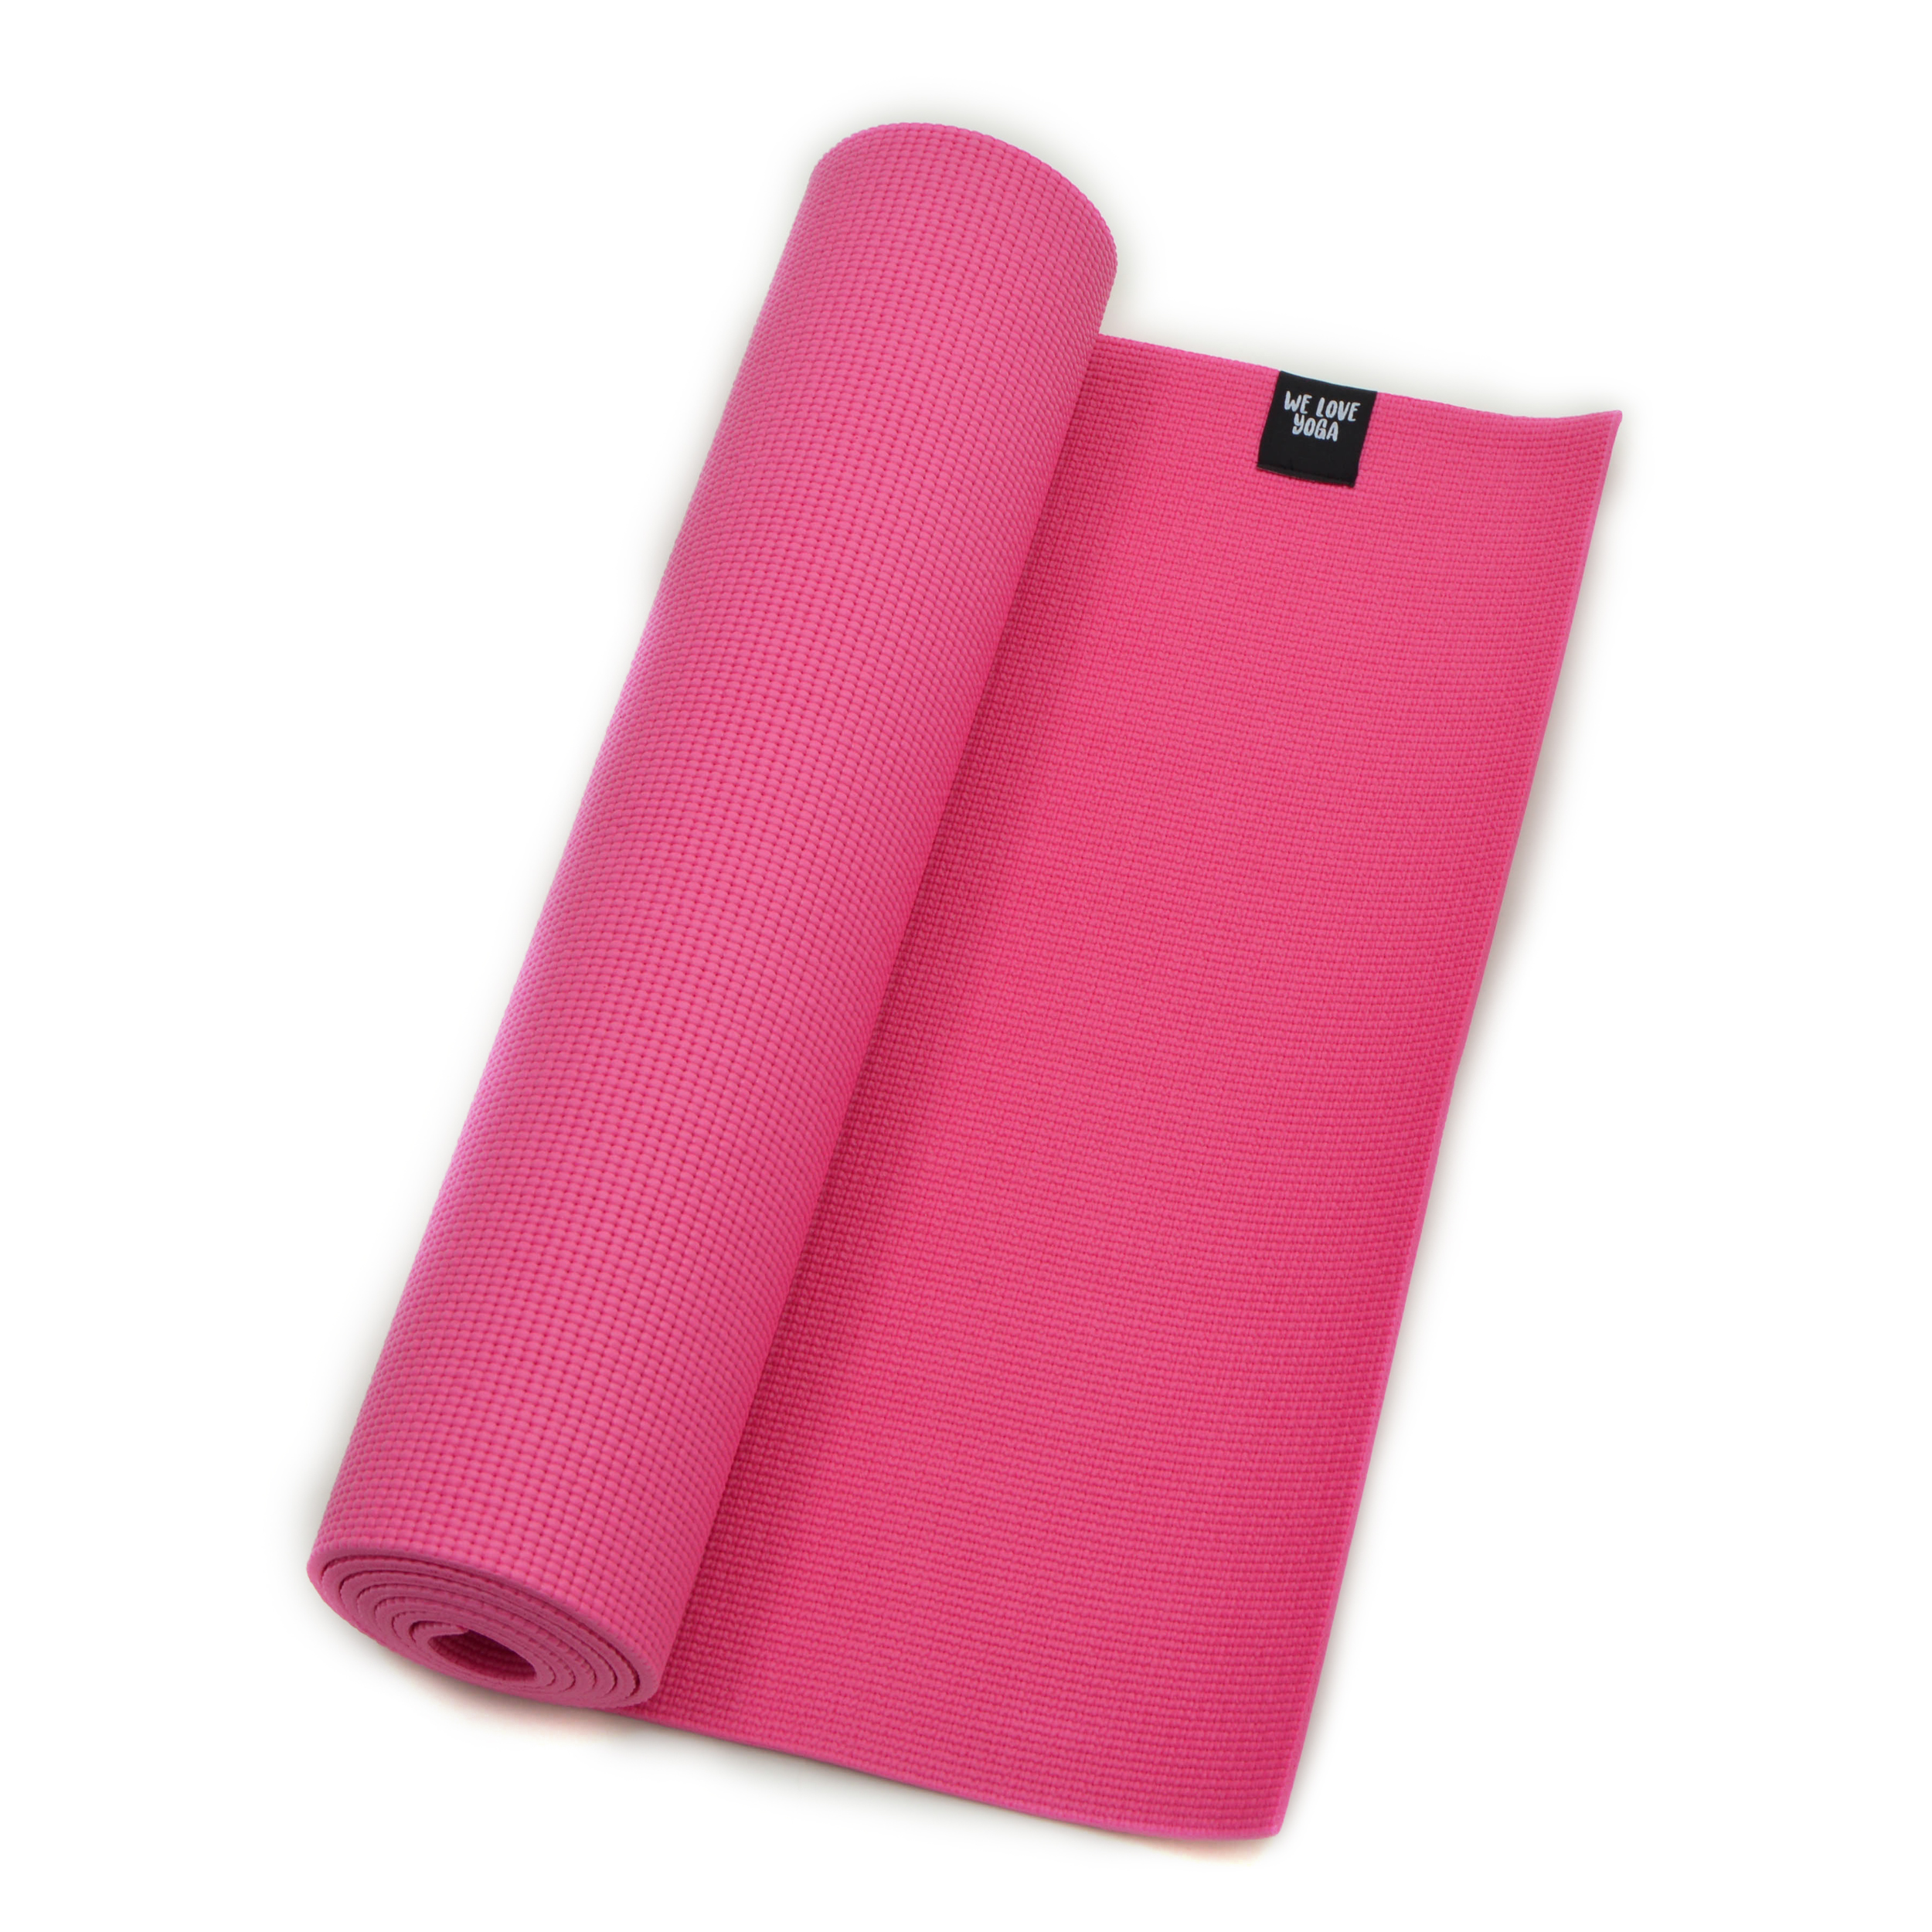 Zen Power PVC Yogamatte, für Yoga, Pilates, Gymnastik, Farbe: pink